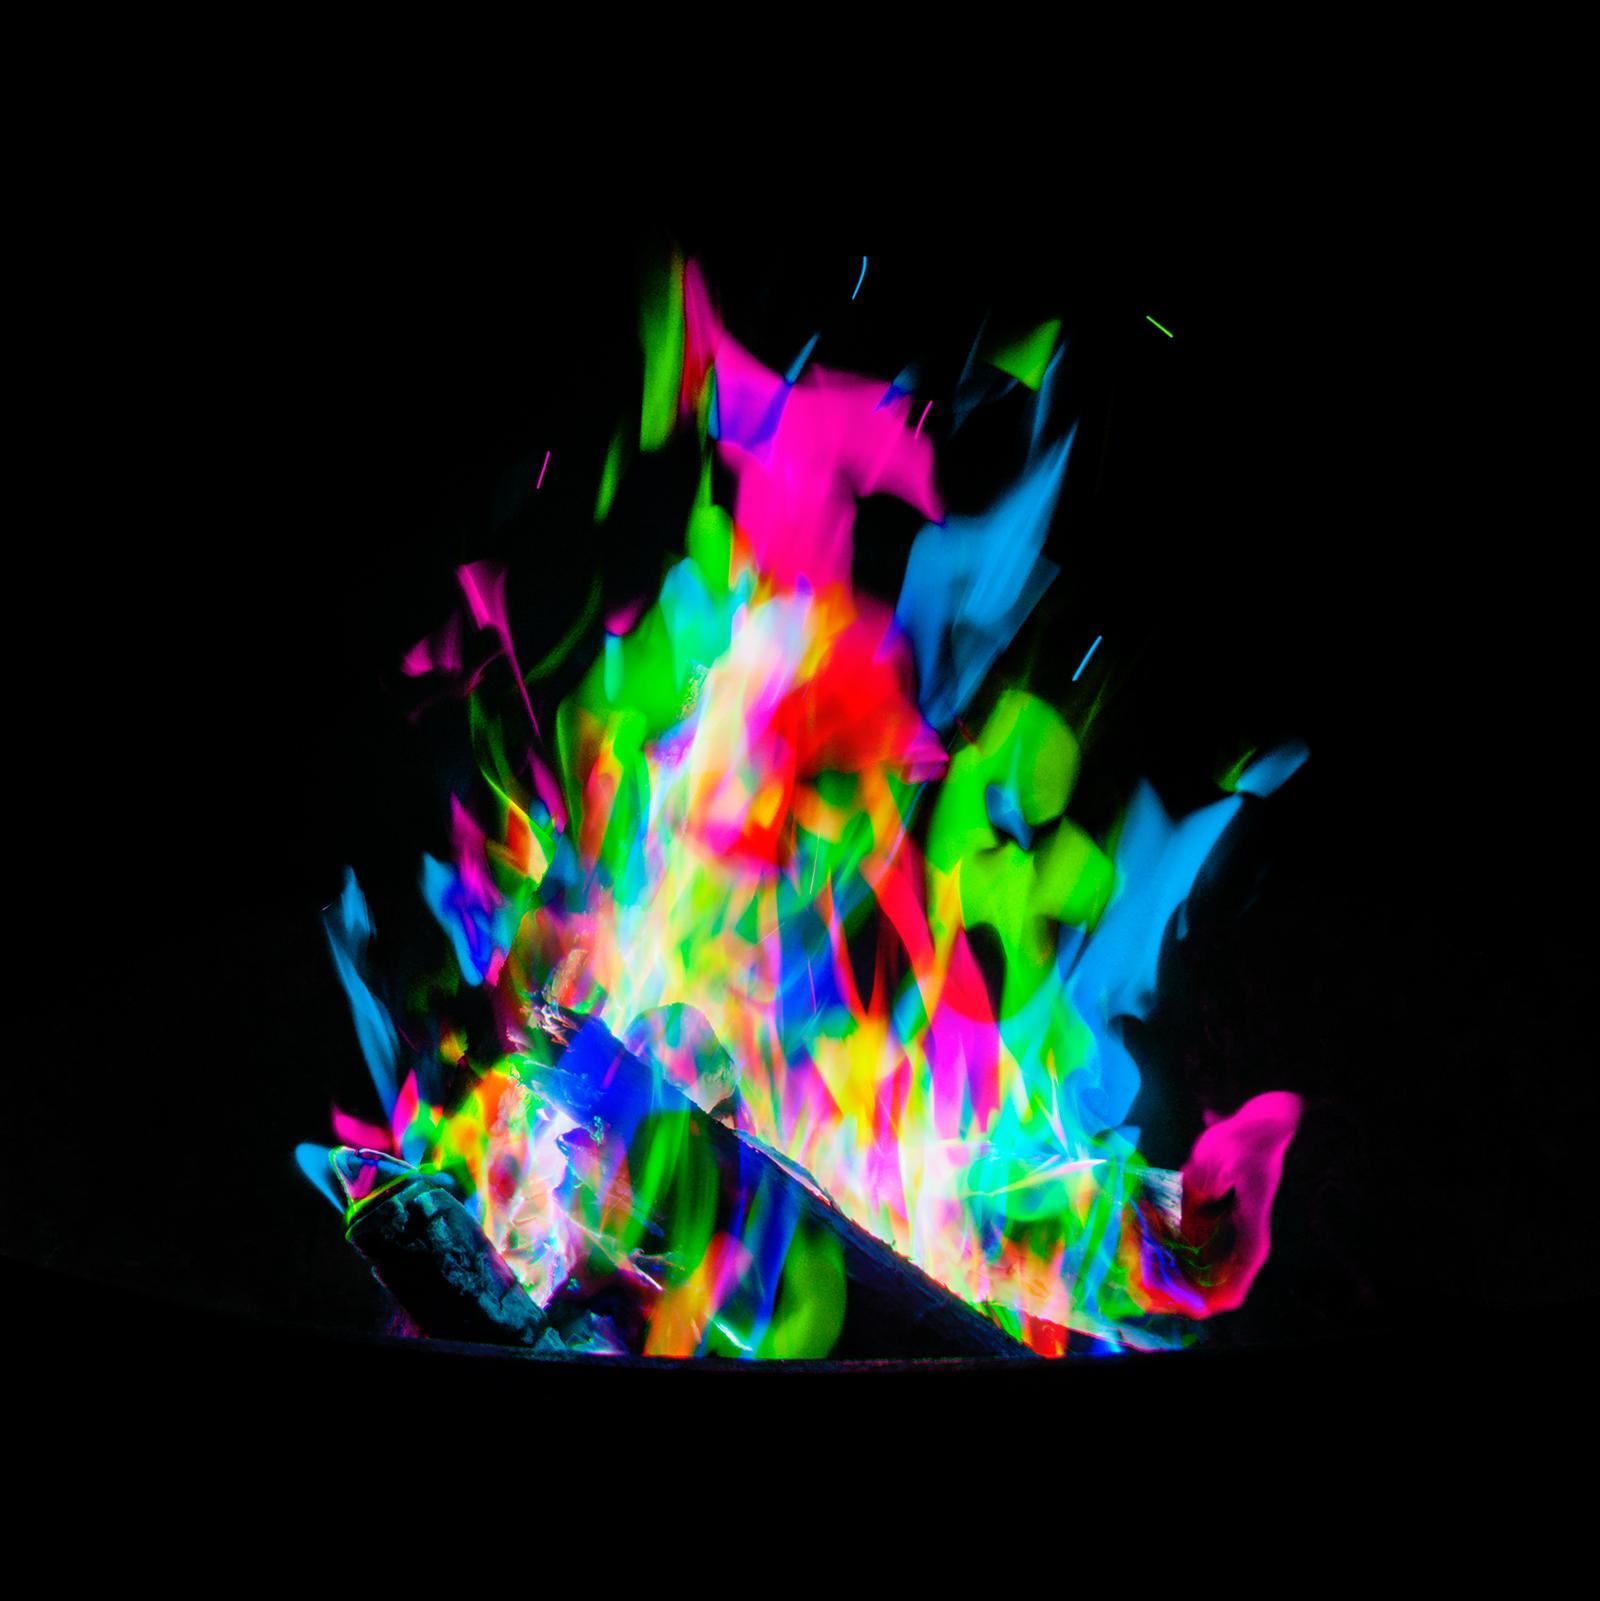 RGB_whidbey_fire_07-1.jpg